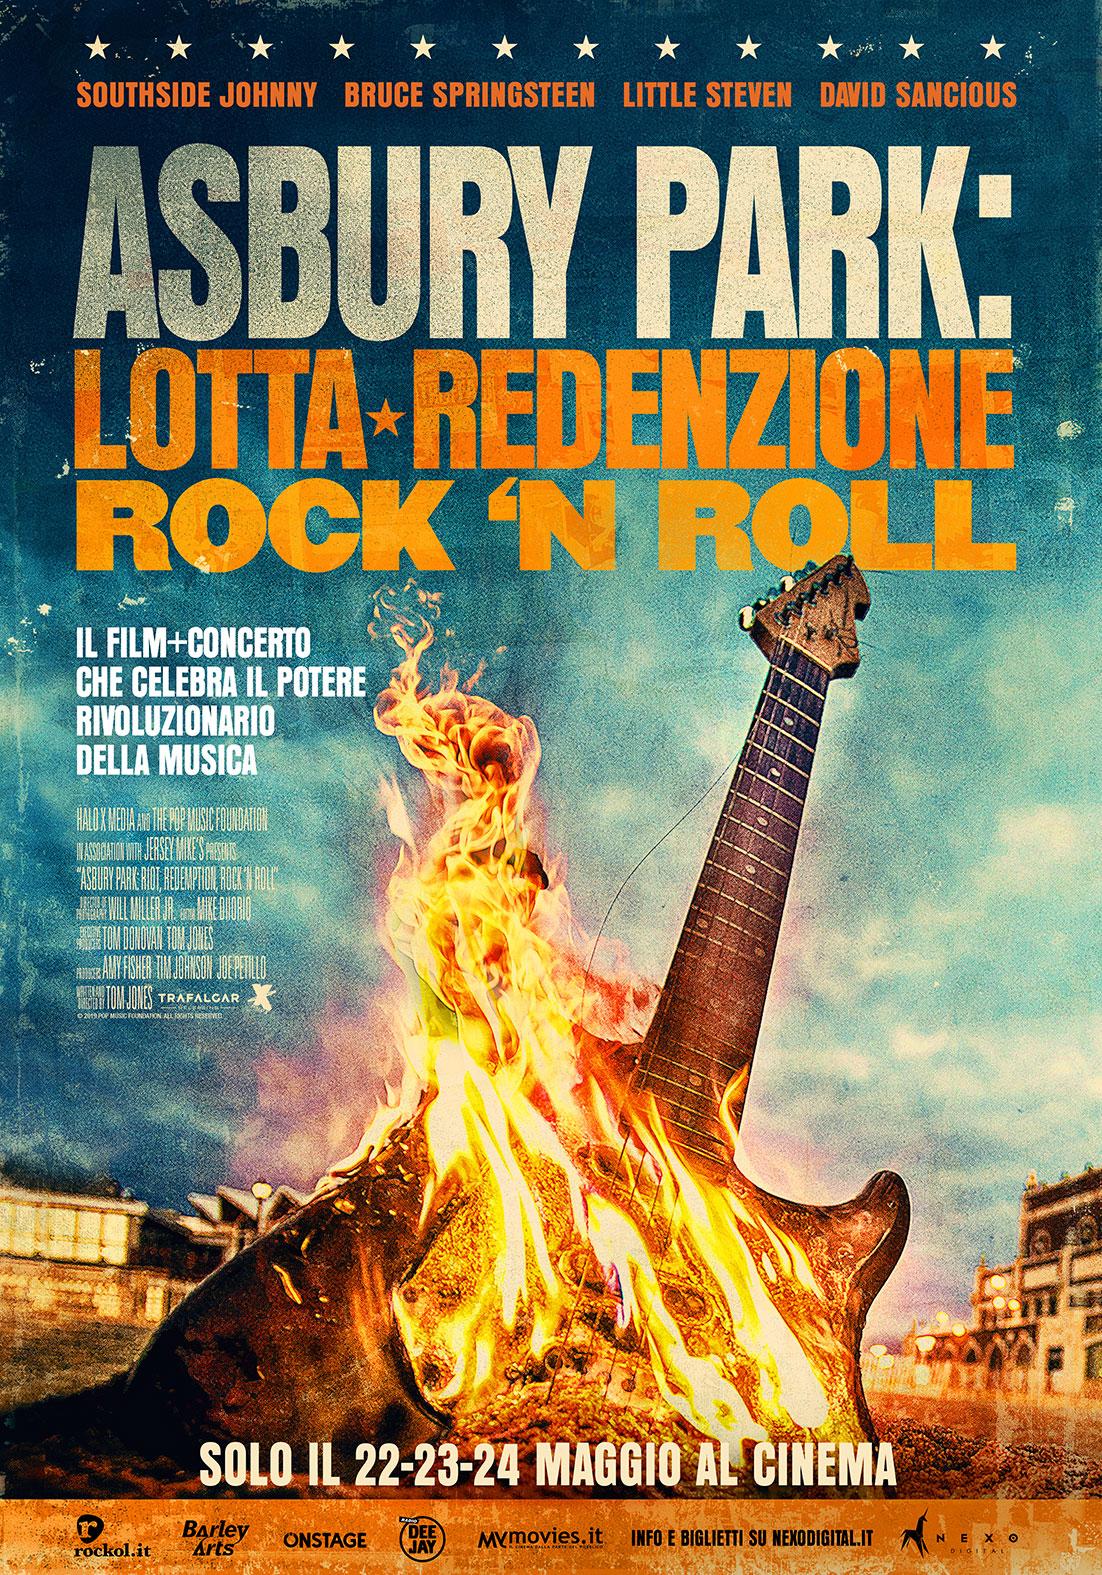 ASBURY PARK: LOTTA REDENZIONE, ROCK 'N ROLL